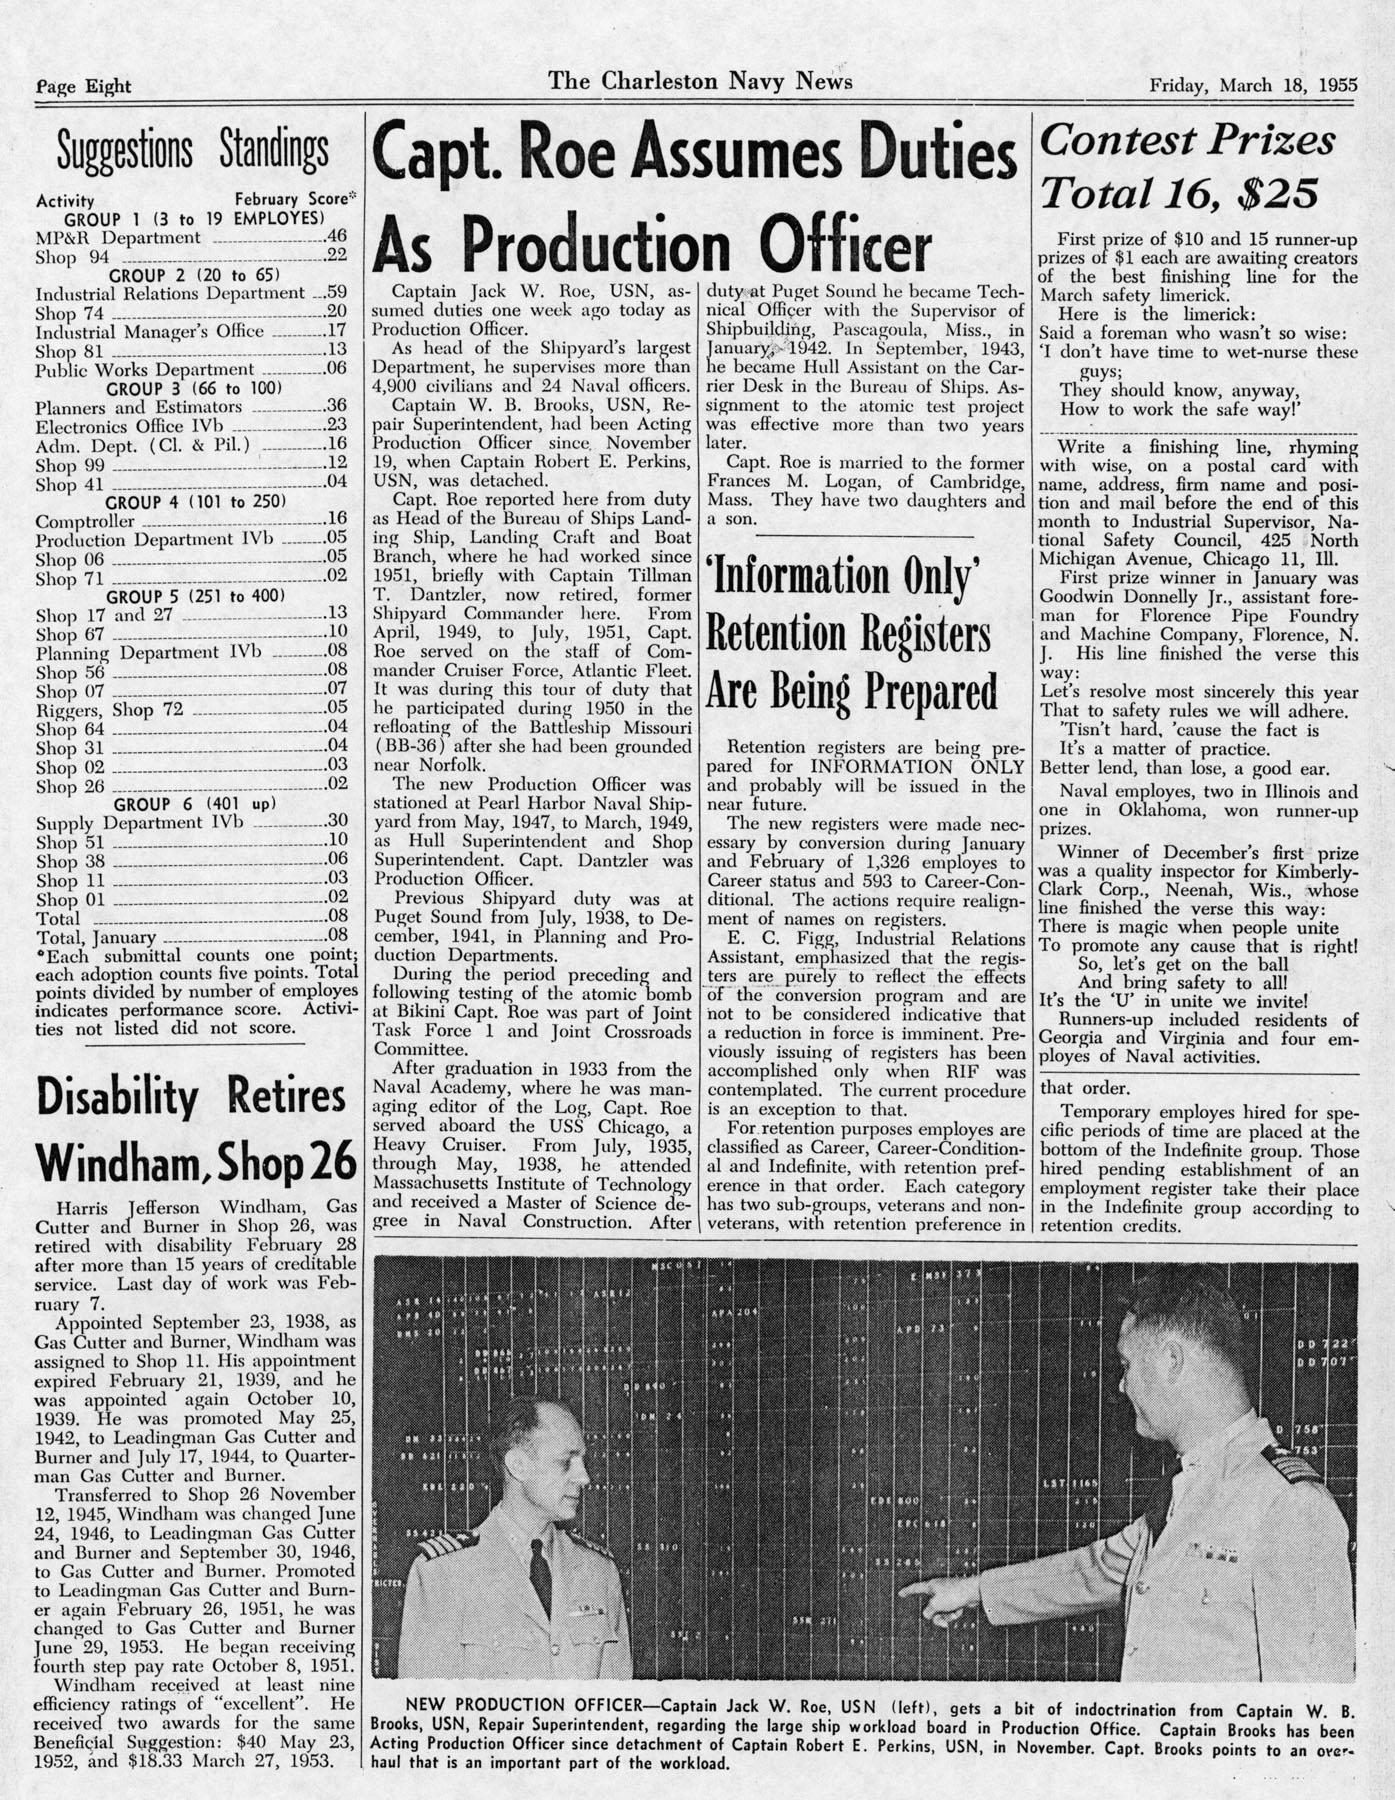 The Charleston Navy News, Volume 13, Edition 18, page viii